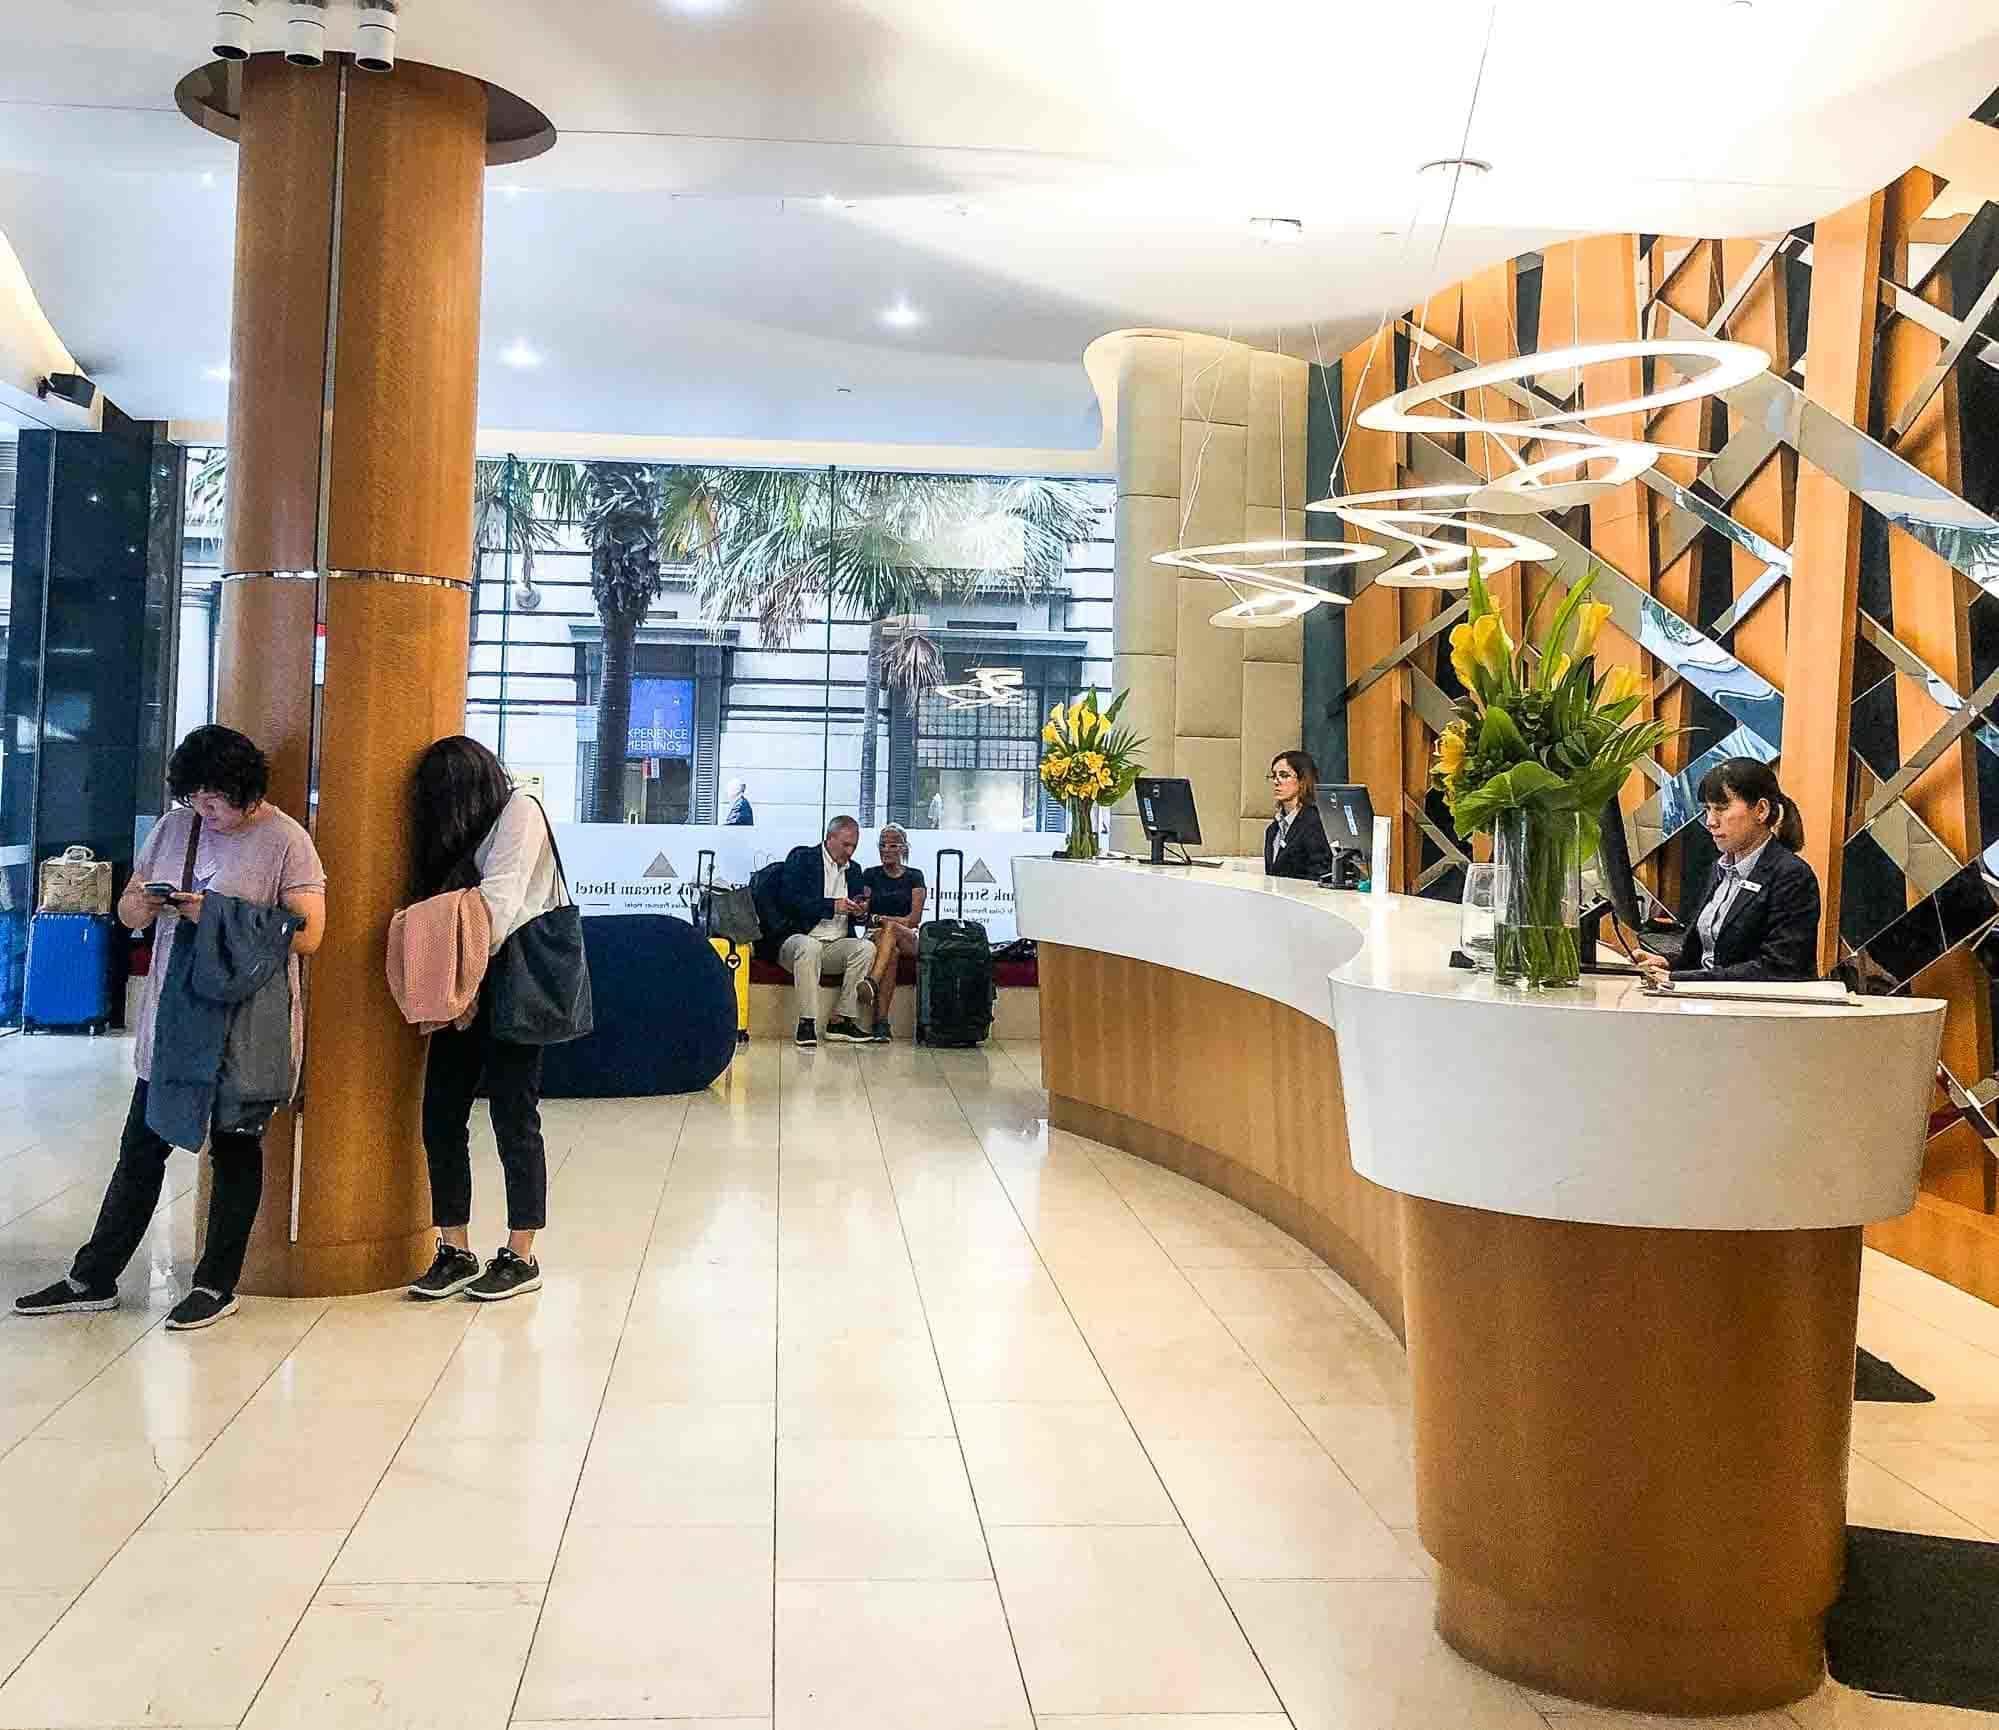 the-tank-stream-hotel-sydney